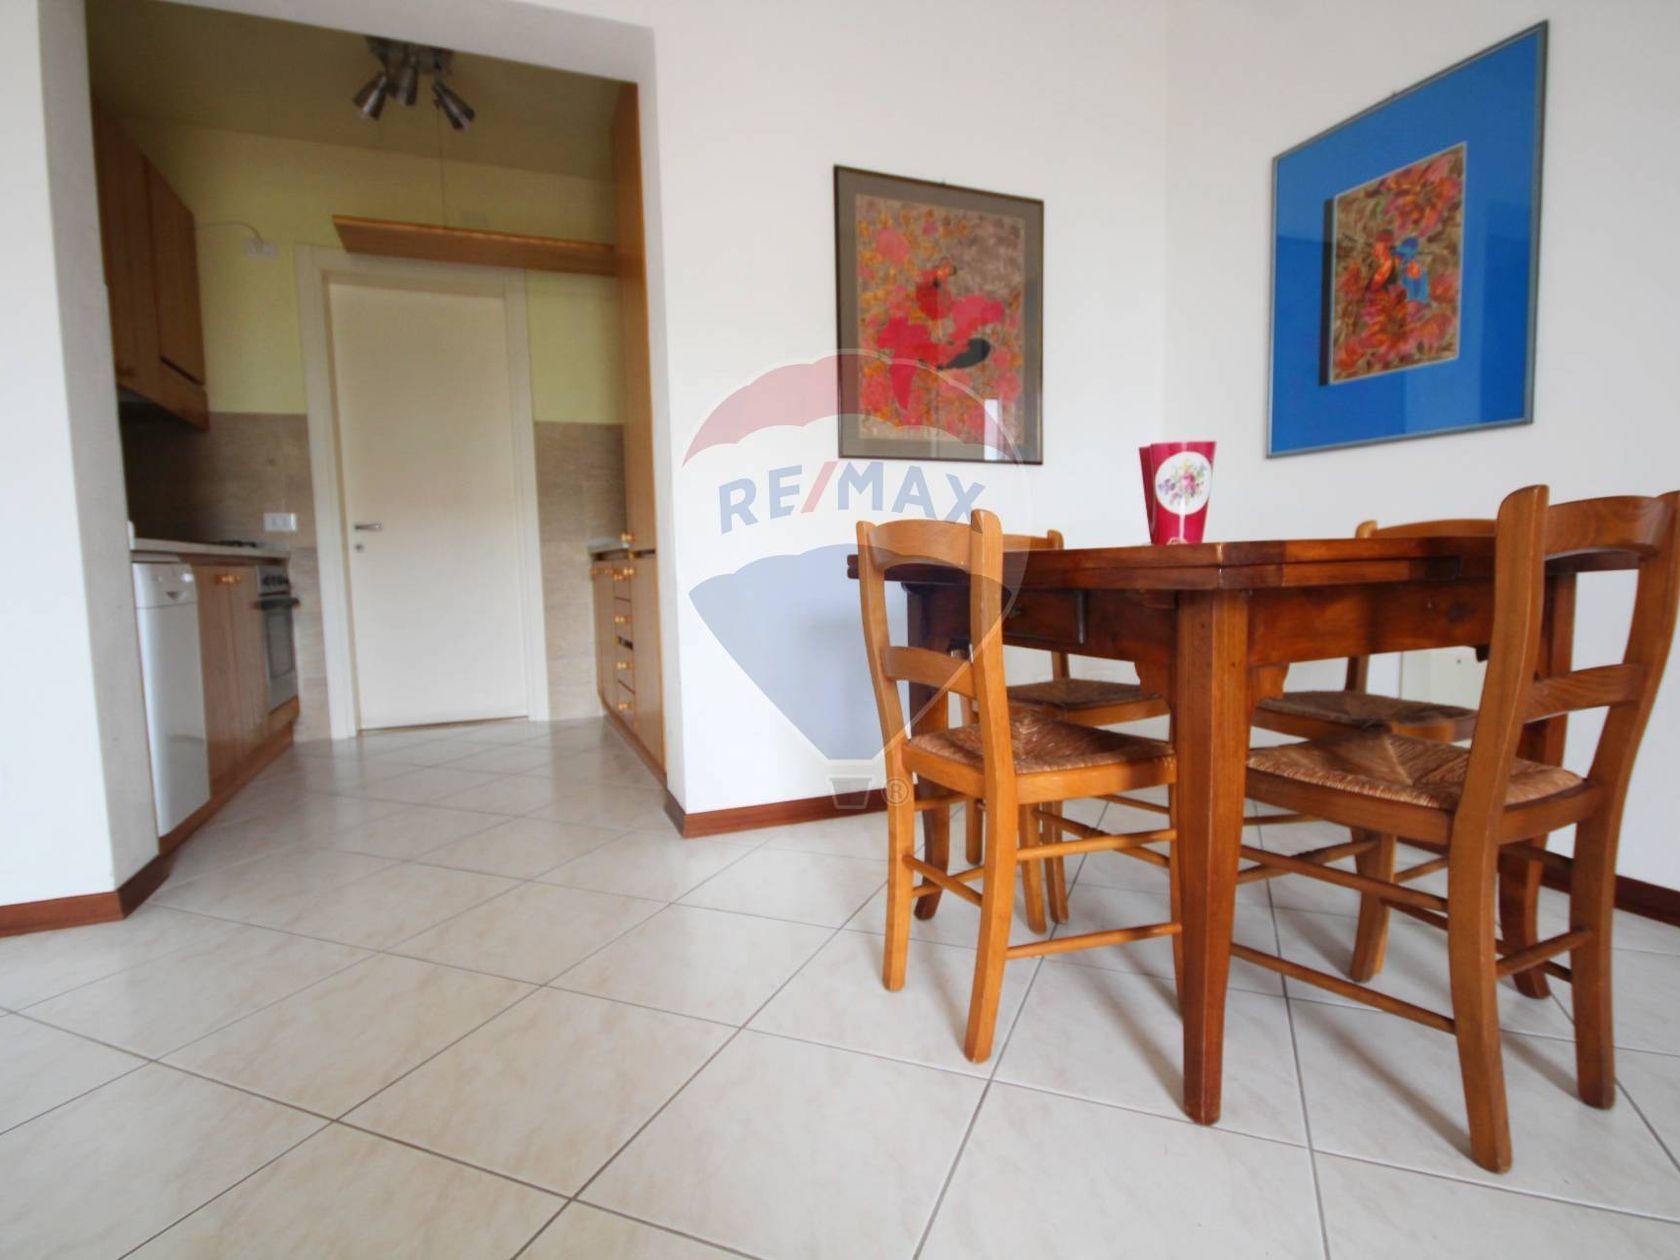 Appartamento Cantarana, Cona, VE Vendita - Foto 2